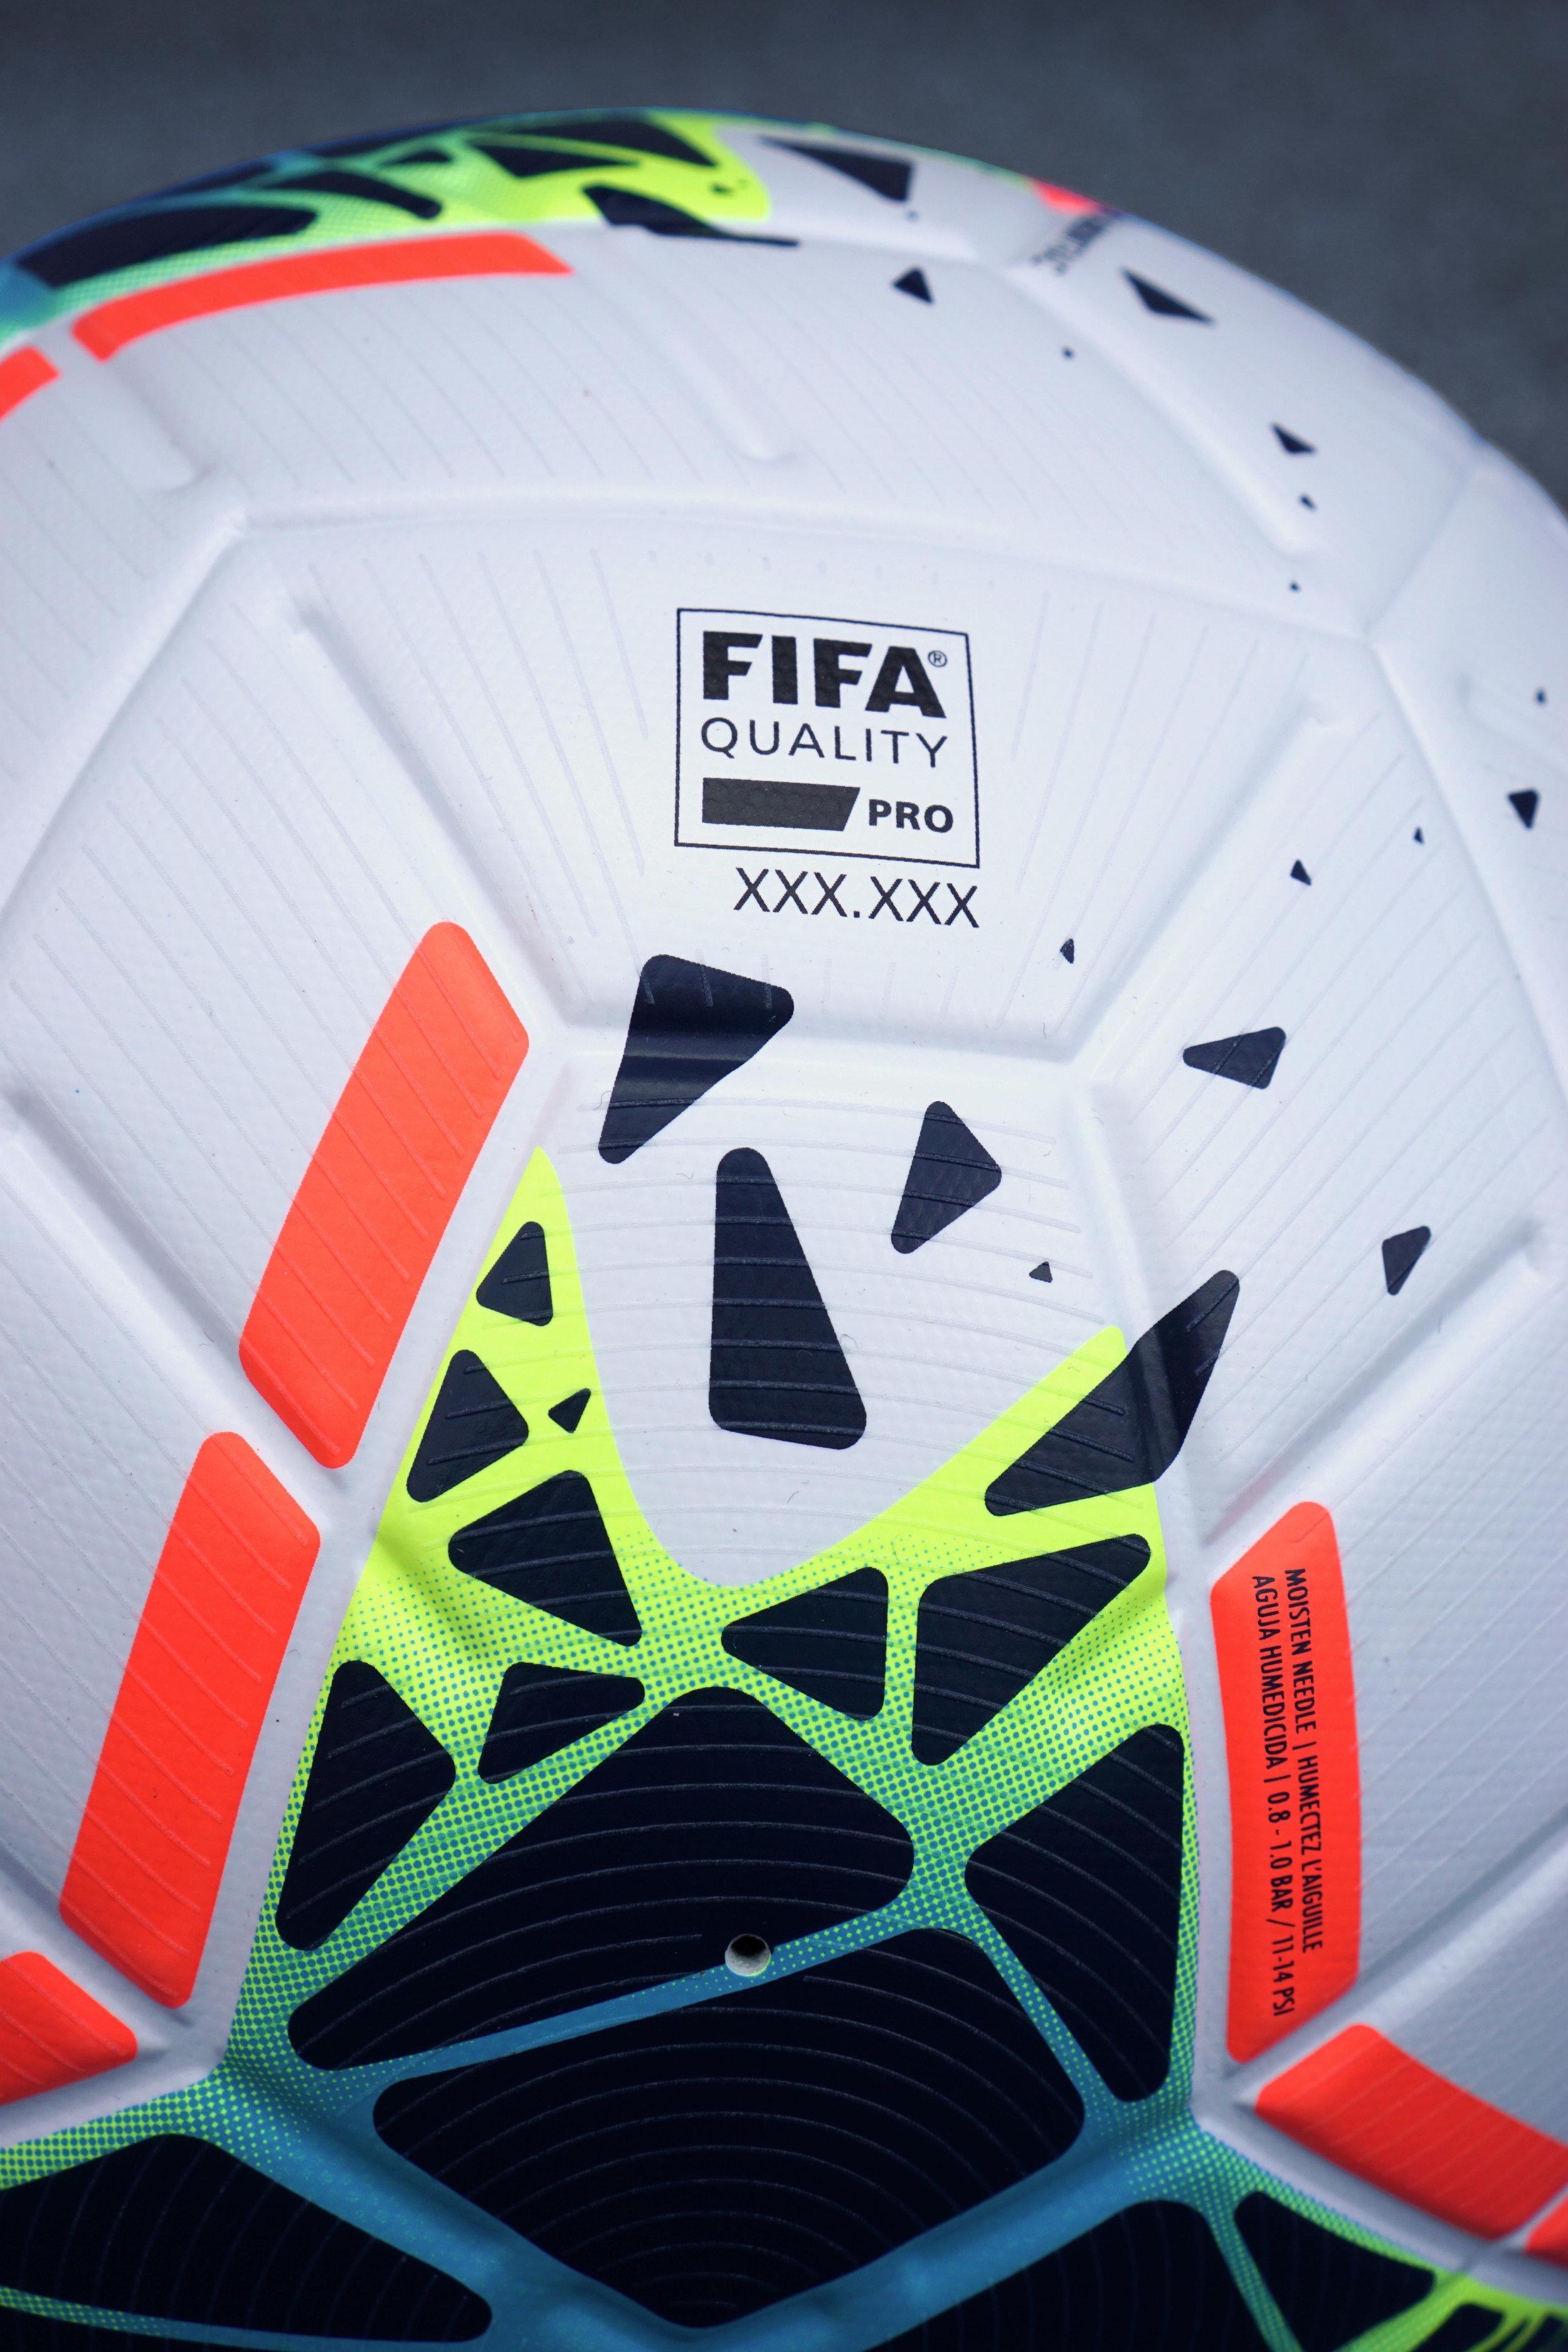 FA19_Inline_Portrait_FIFALogoDetail.jpg